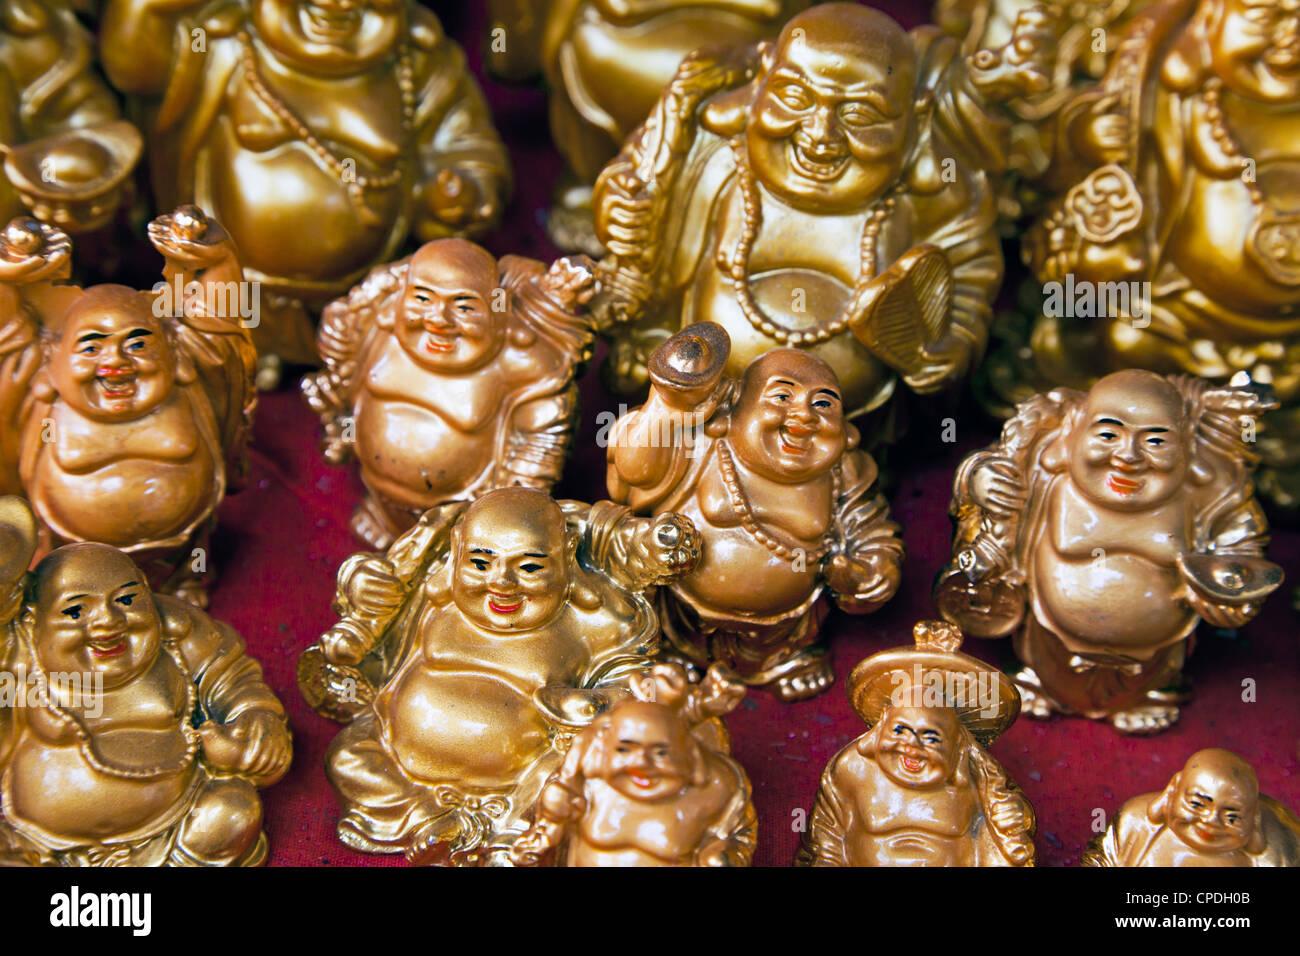 Mini figure di Buddha in vendita in un negozio in Mumbai, India, Asia Immagini Stock